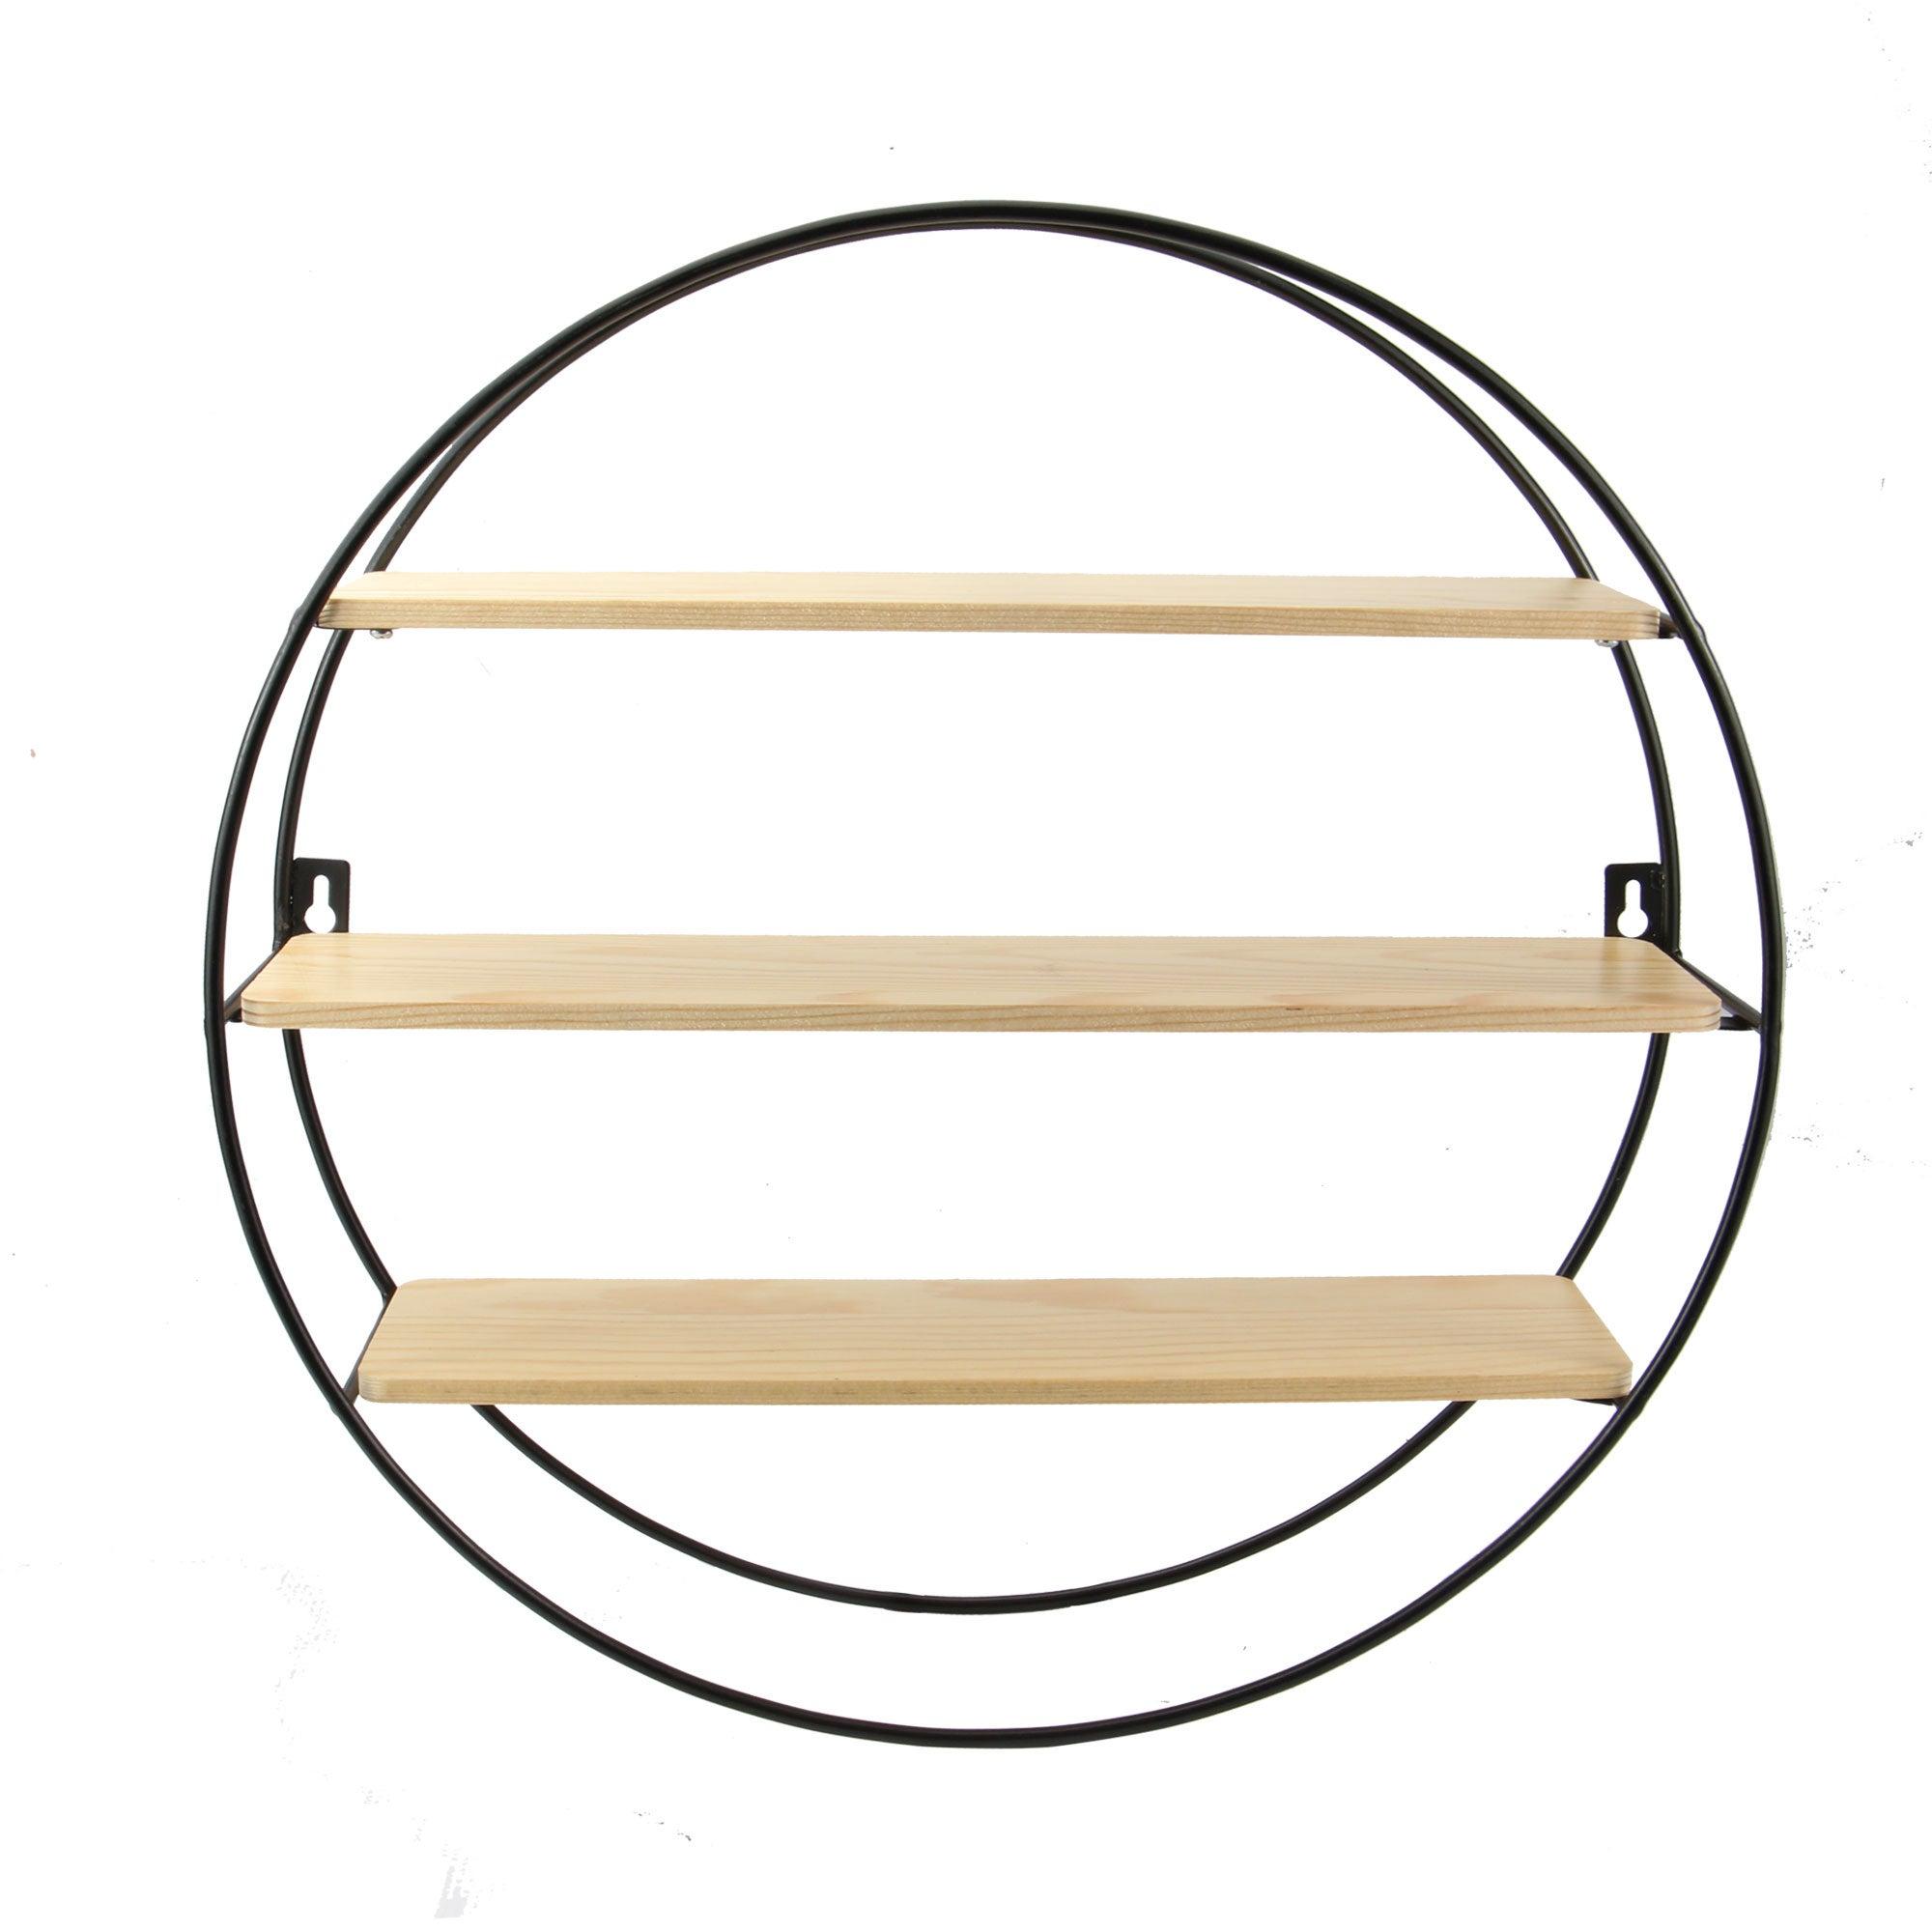 Floating Circle Shelf - M&W 3 Tier